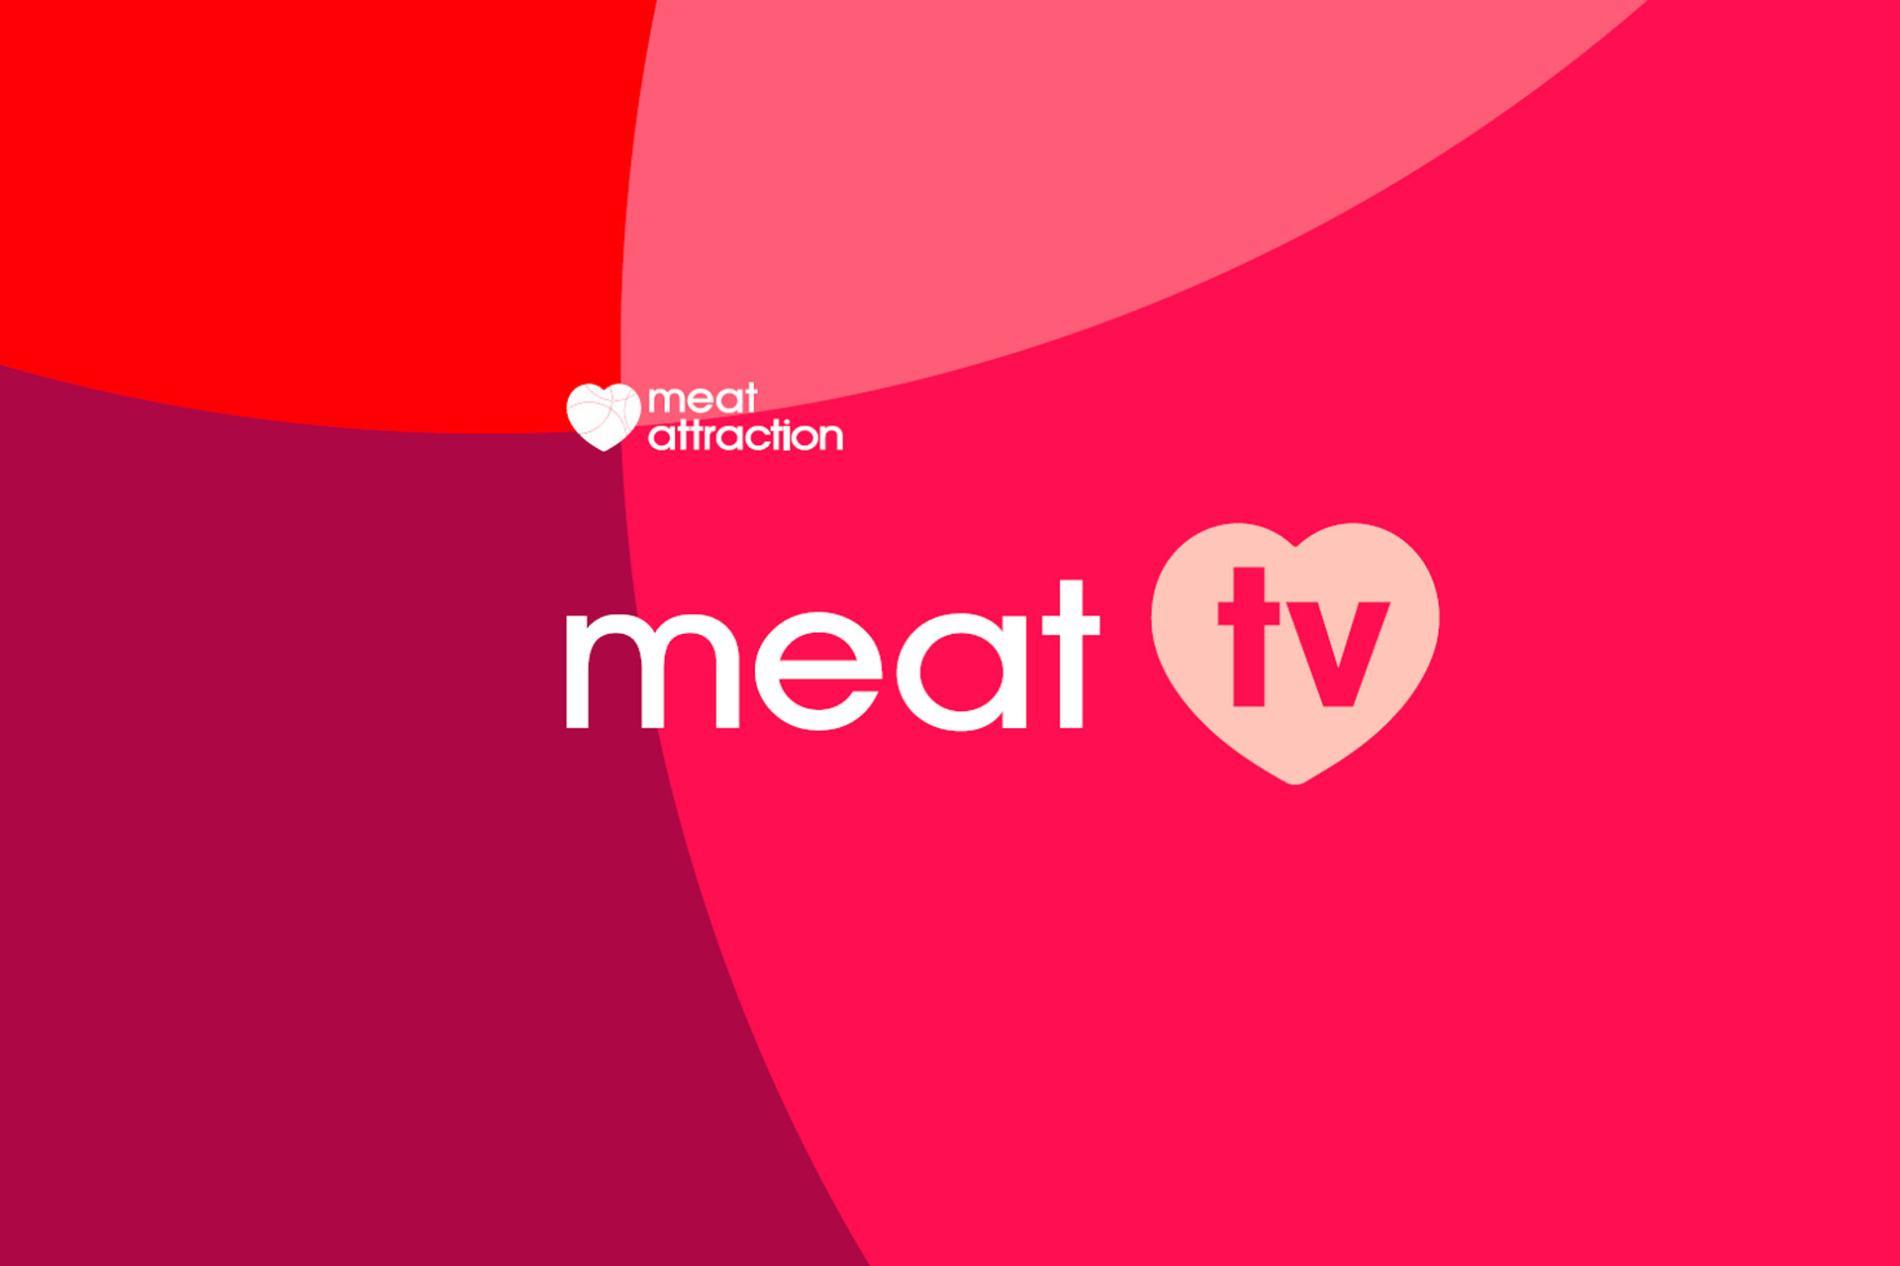 Meat TV